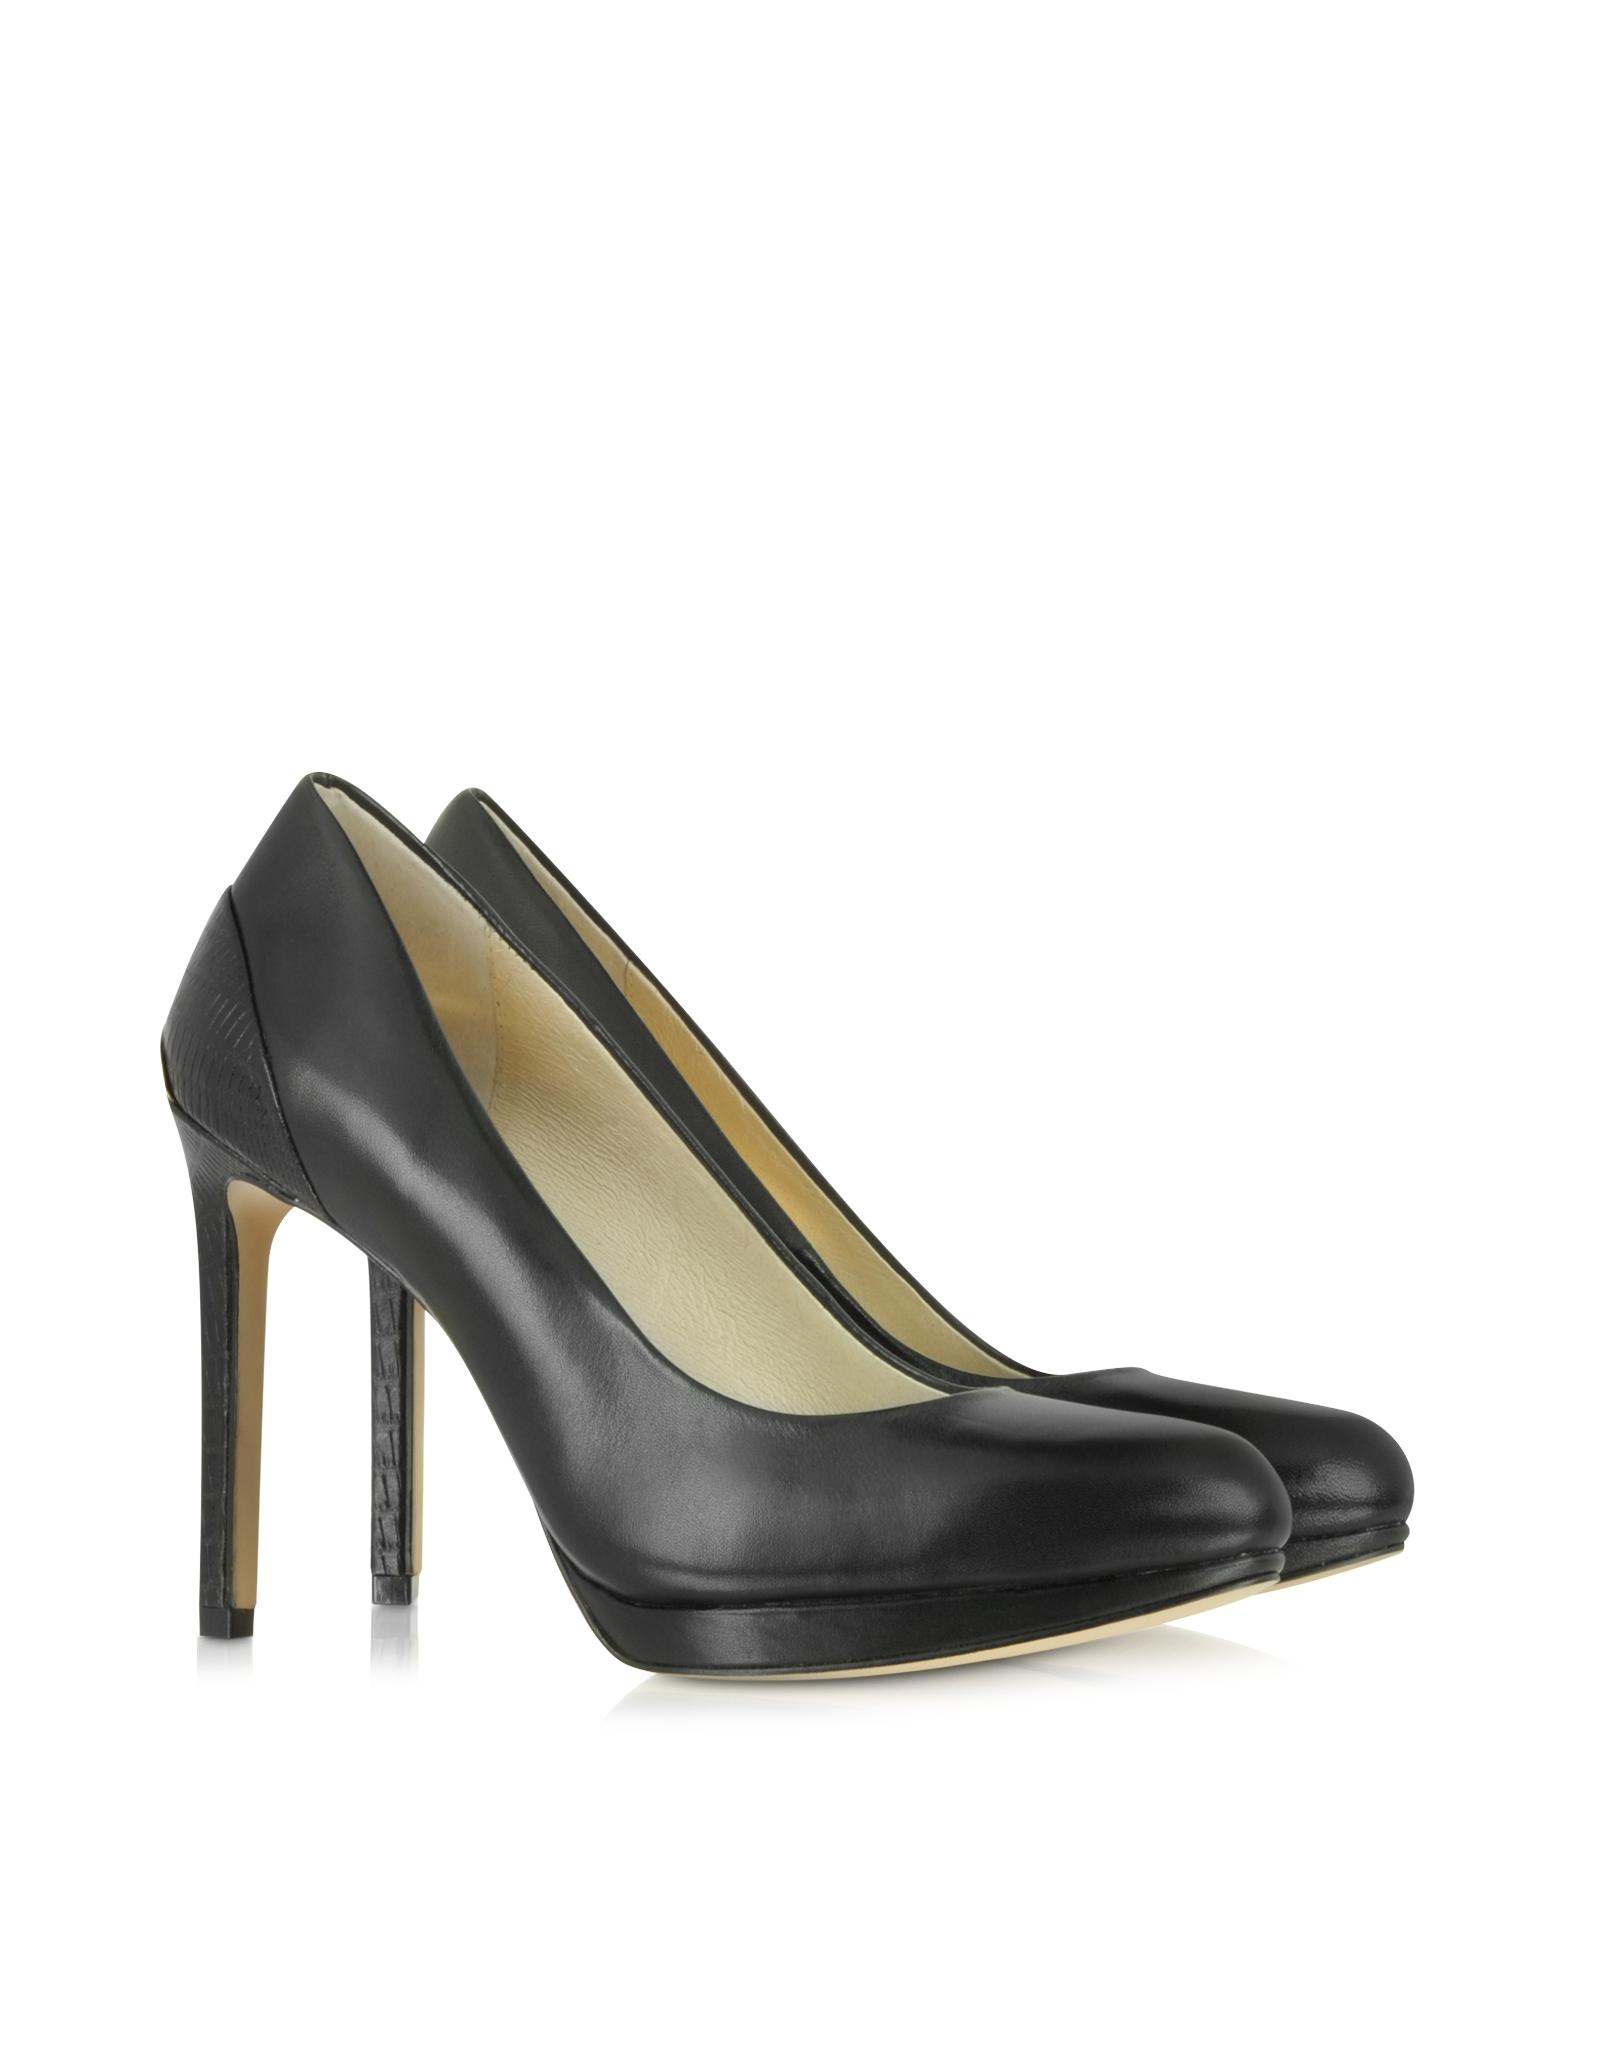 lyst michael kors yasmin black leather pump in black. Black Bedroom Furniture Sets. Home Design Ideas